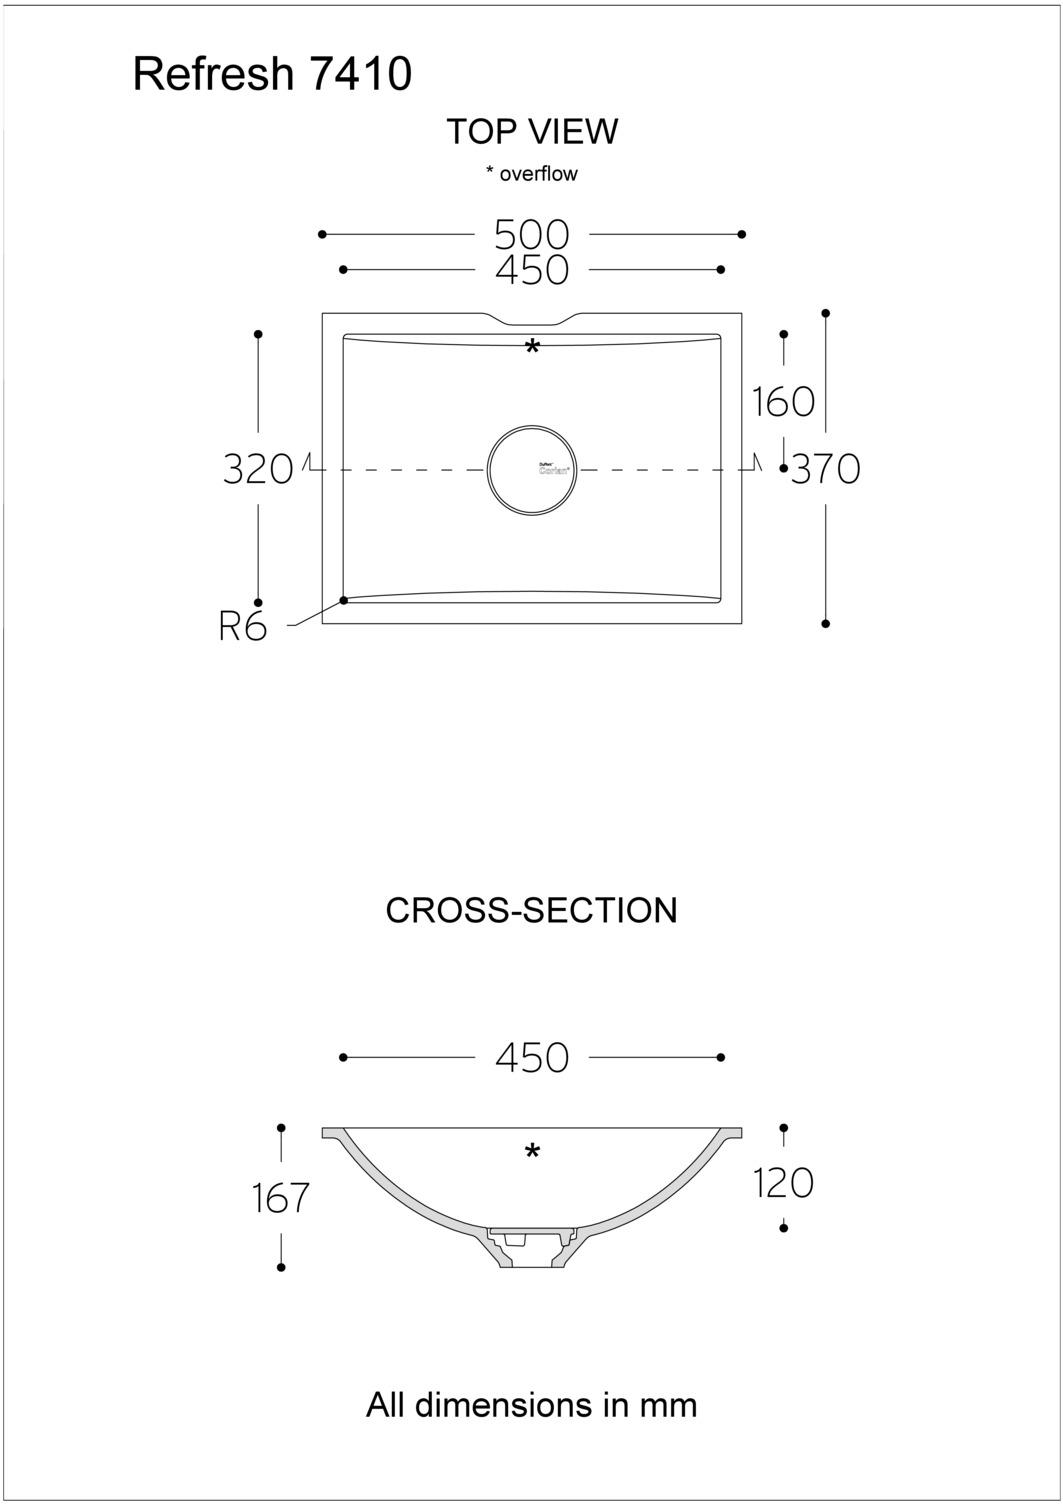 DUPONT_CORIAN_REFRESH7410_2D_PDF[0]